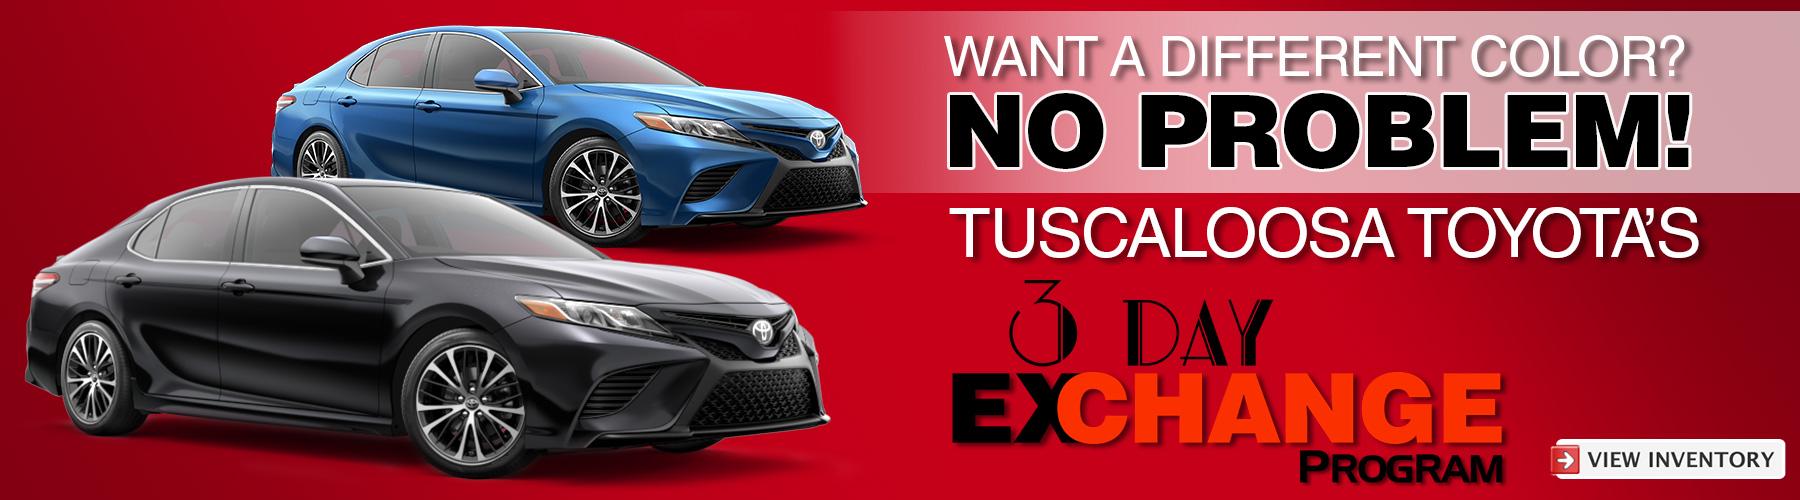 3 Day Exchange Program Available at Tuscaloosa Toyota in Tuscaloosa, AL